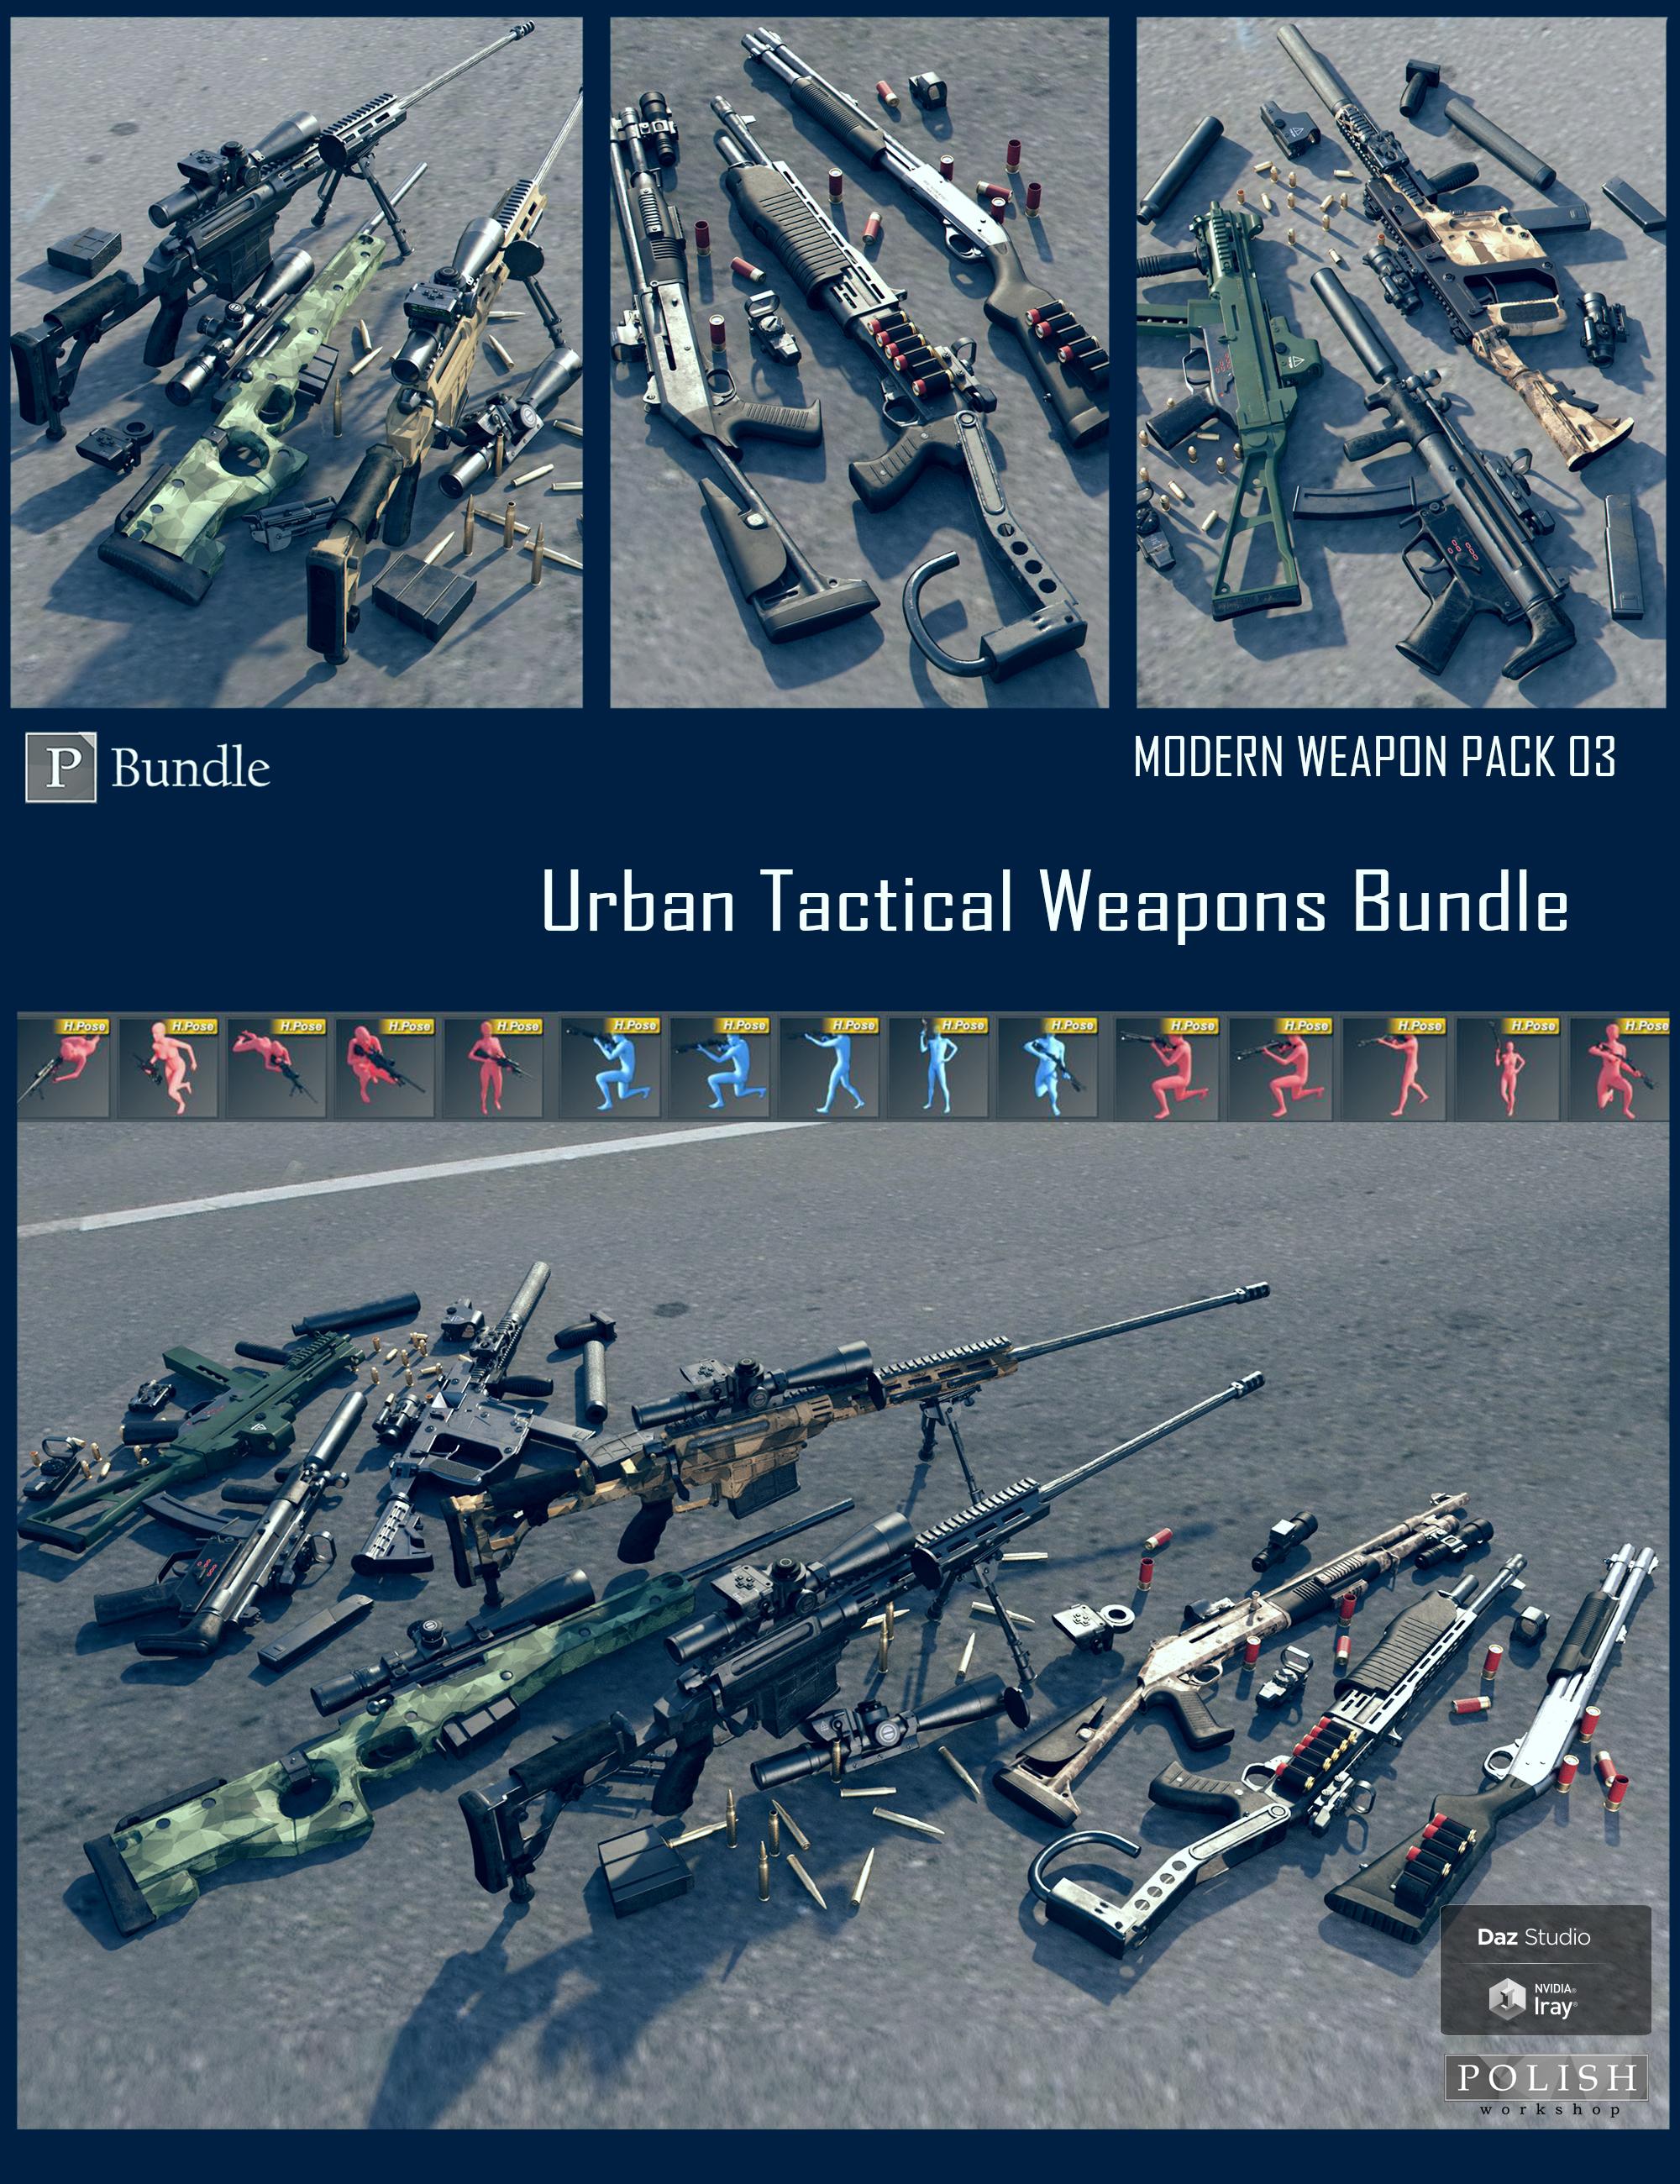 Urban Tactical Weapons Bundle by: Polish, 3D Models by Daz 3D